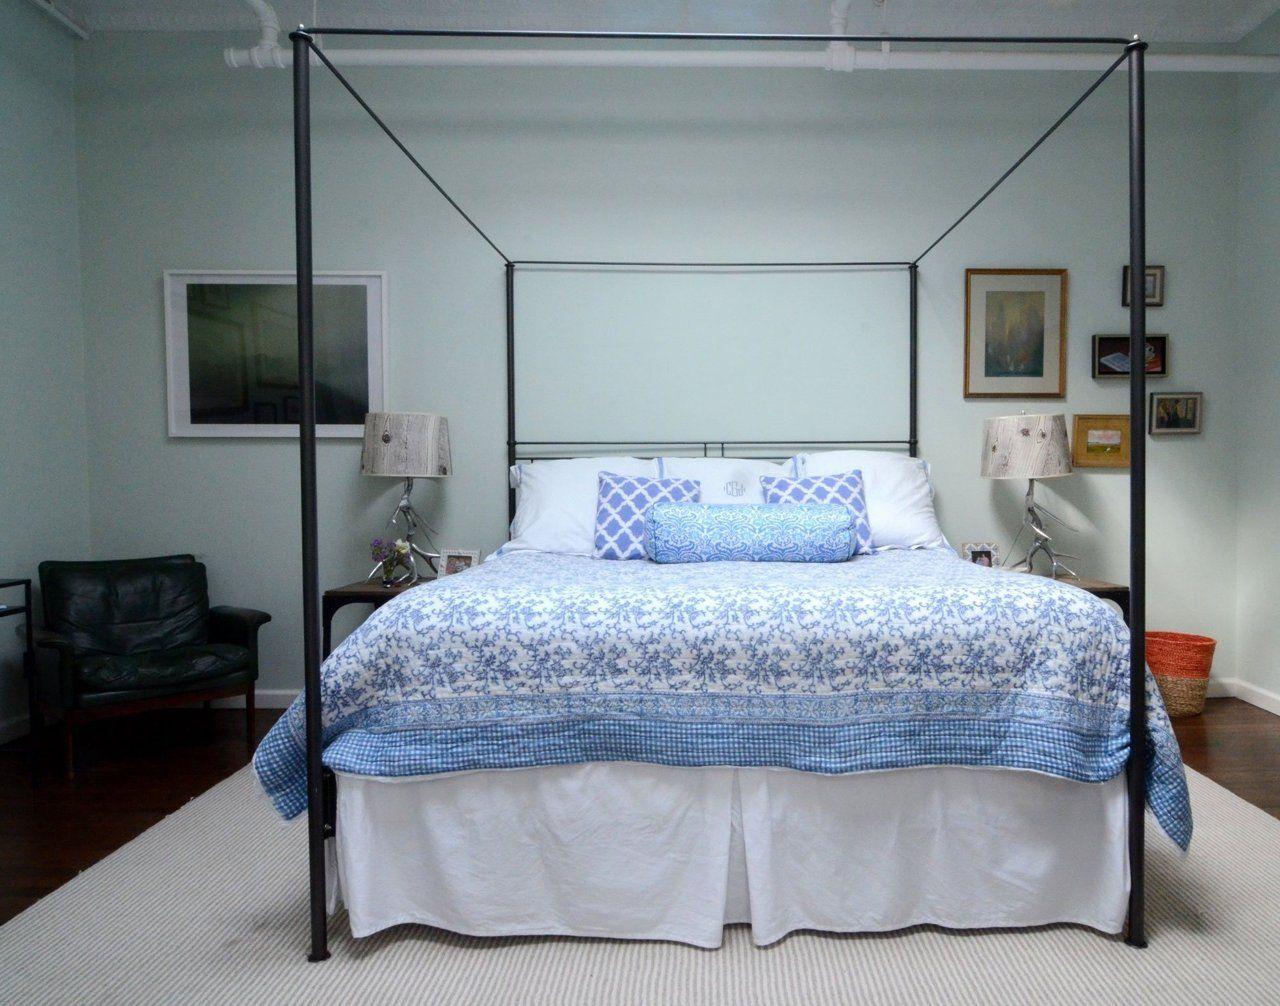 3 bedroom loft house  House Tour A Modern Manhattan Loft  Lofts Bedrooms and House tours